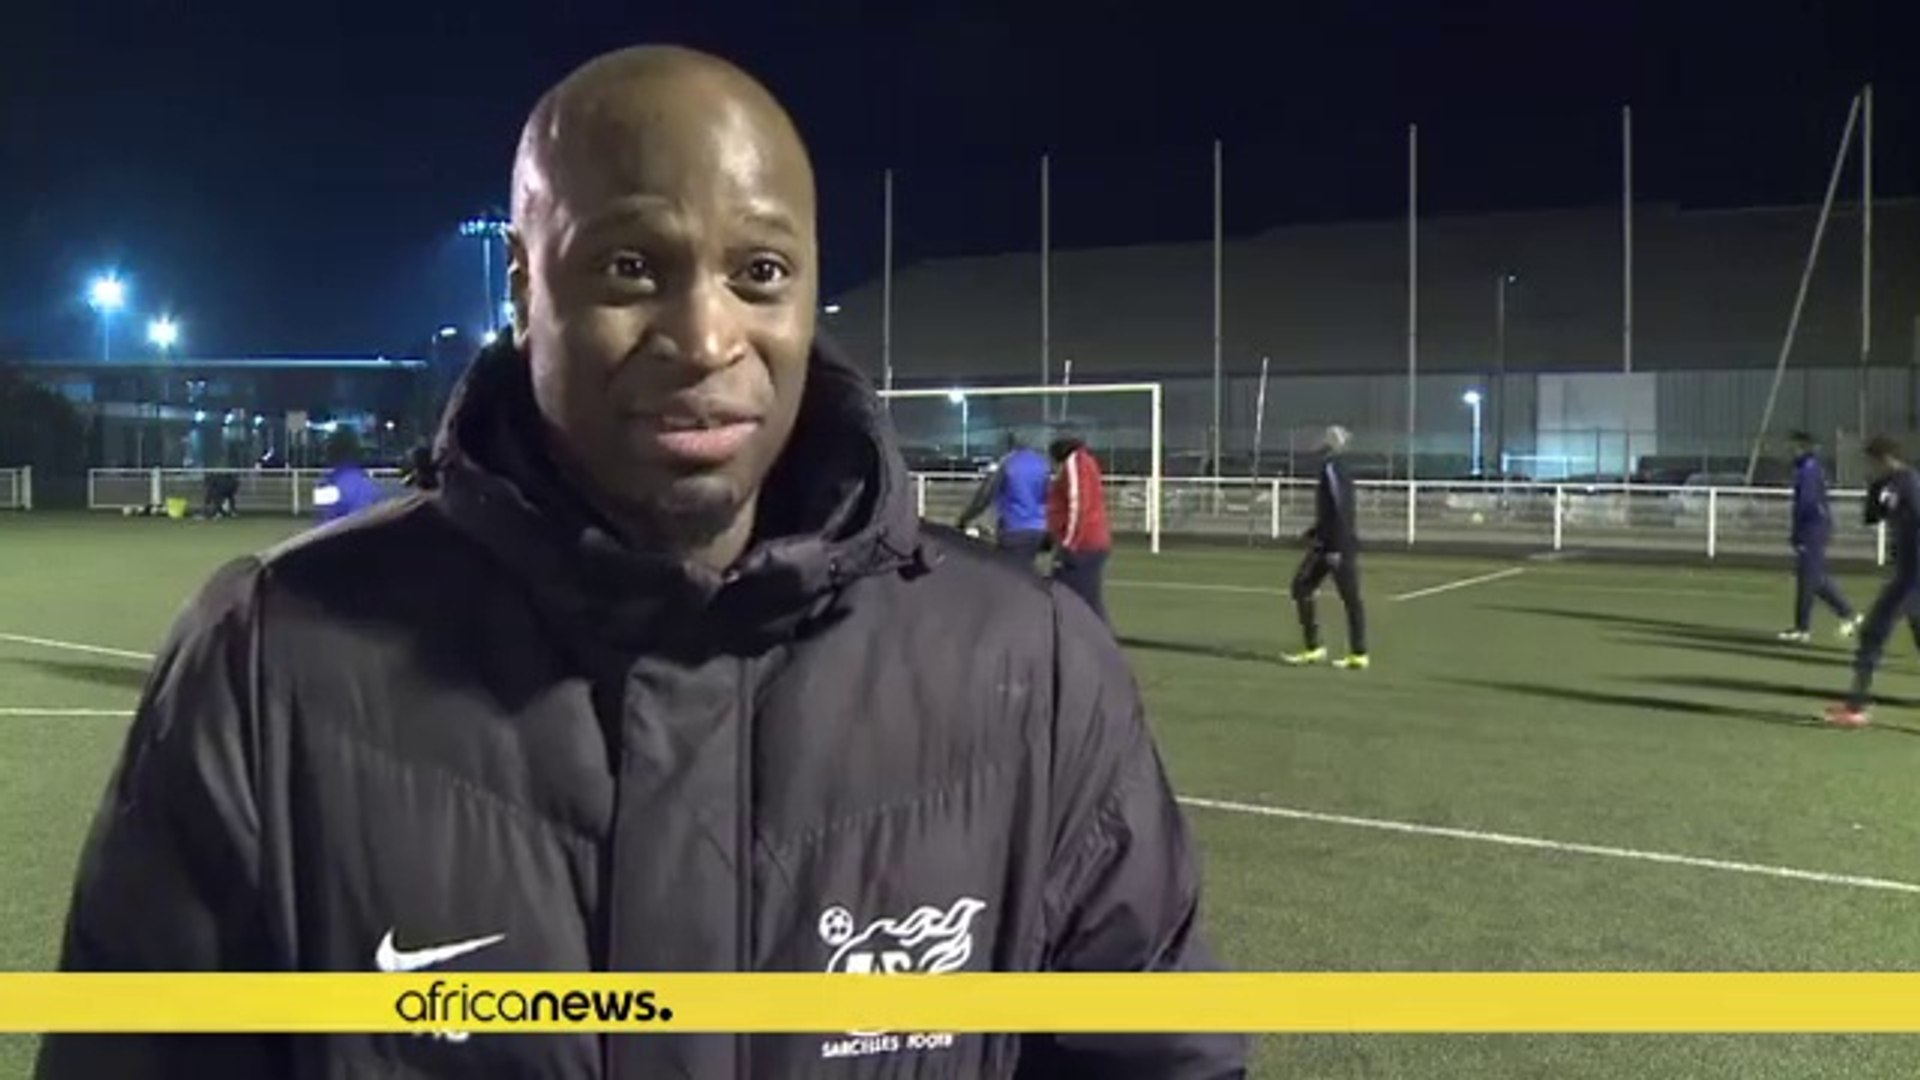 Africa News - Sarcelles fière de Riyad Mahrez